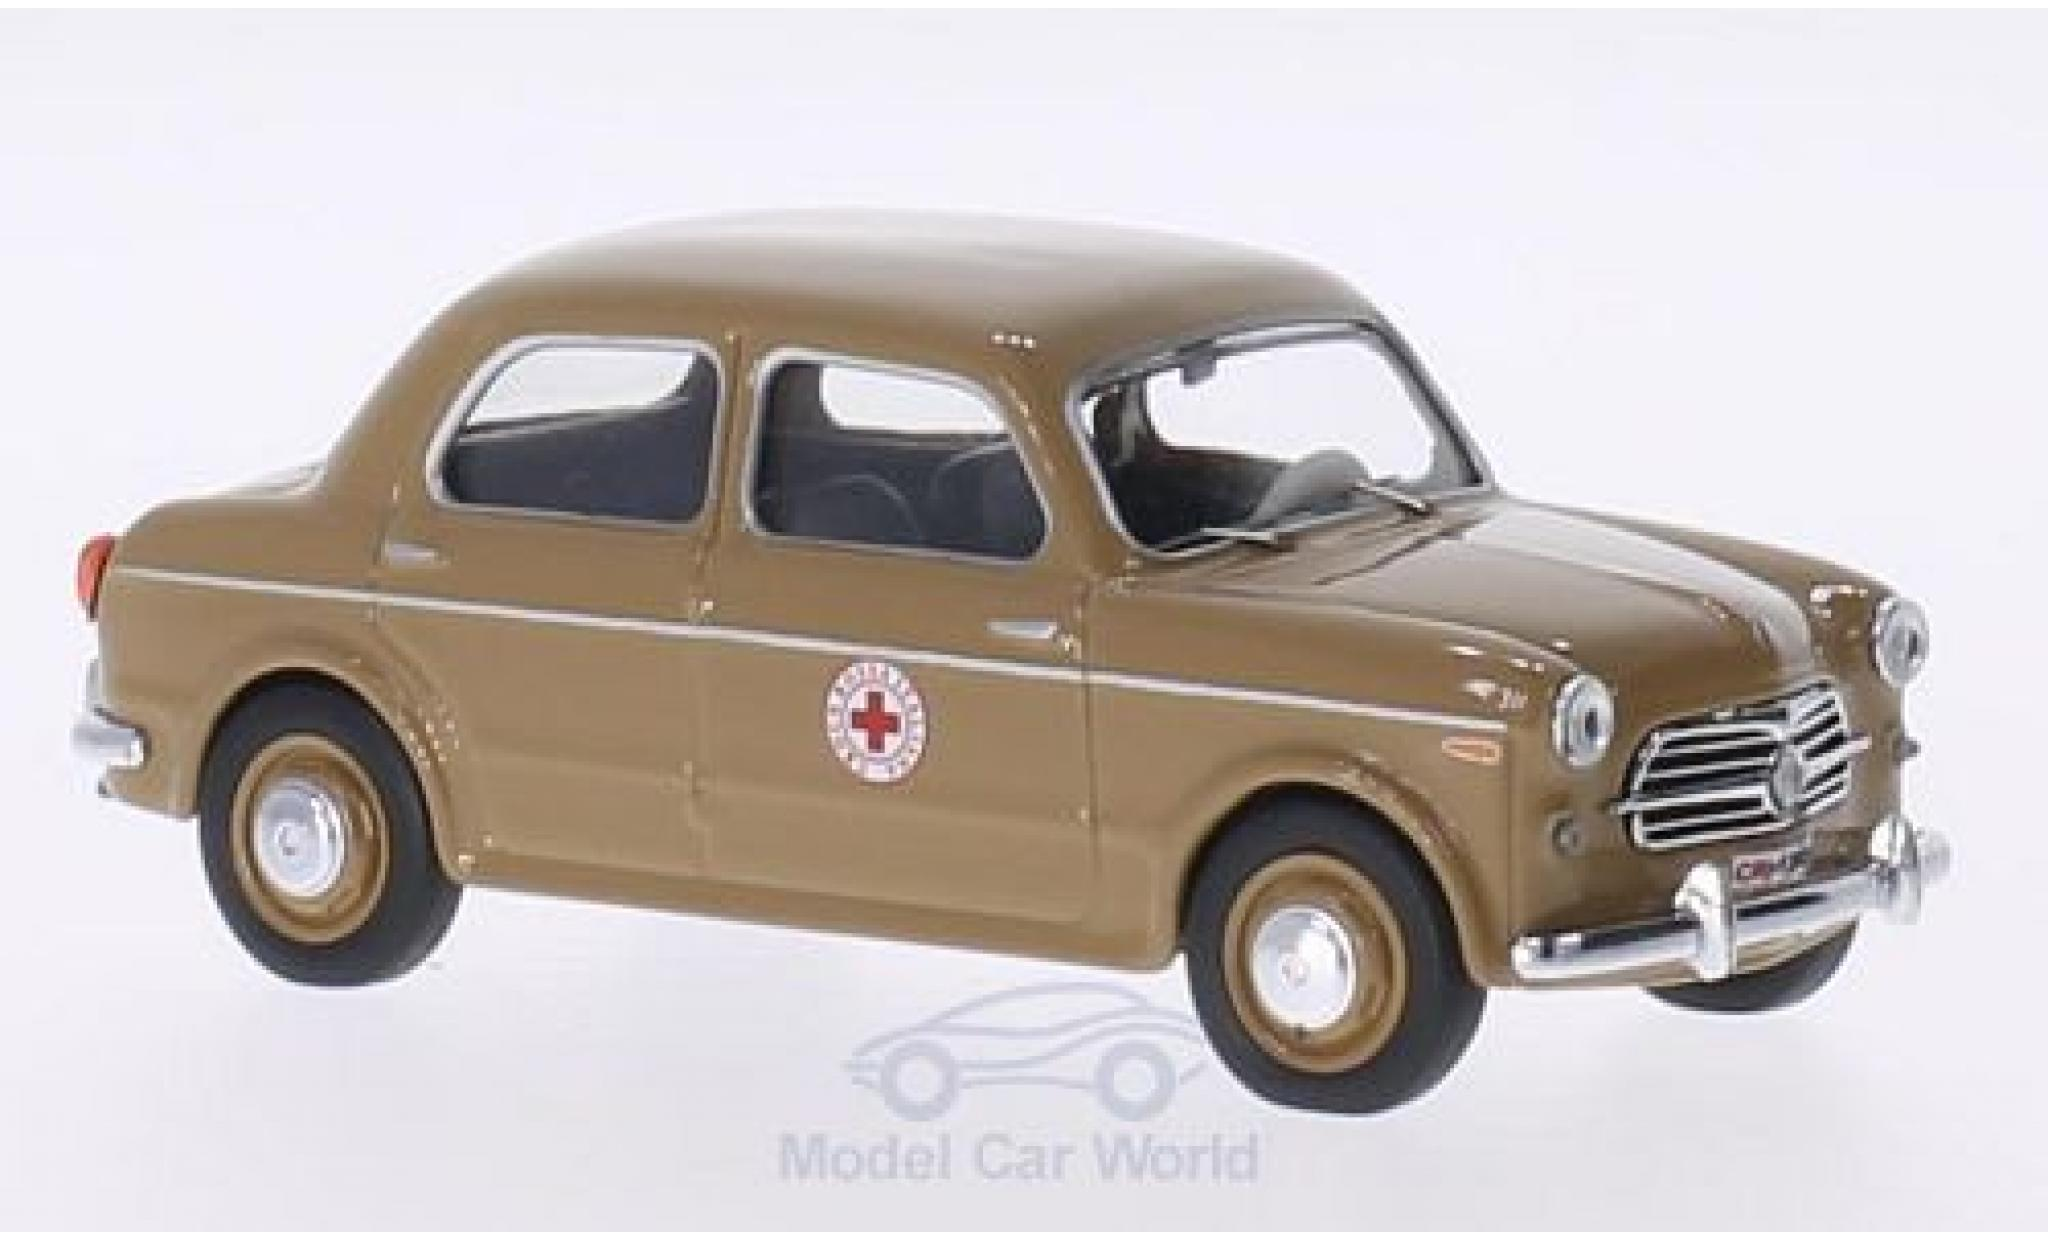 Fiat 1100 1956 1/43 Rio /103 brown Croce Rossa 1956 Rotes Kreuz (IT)